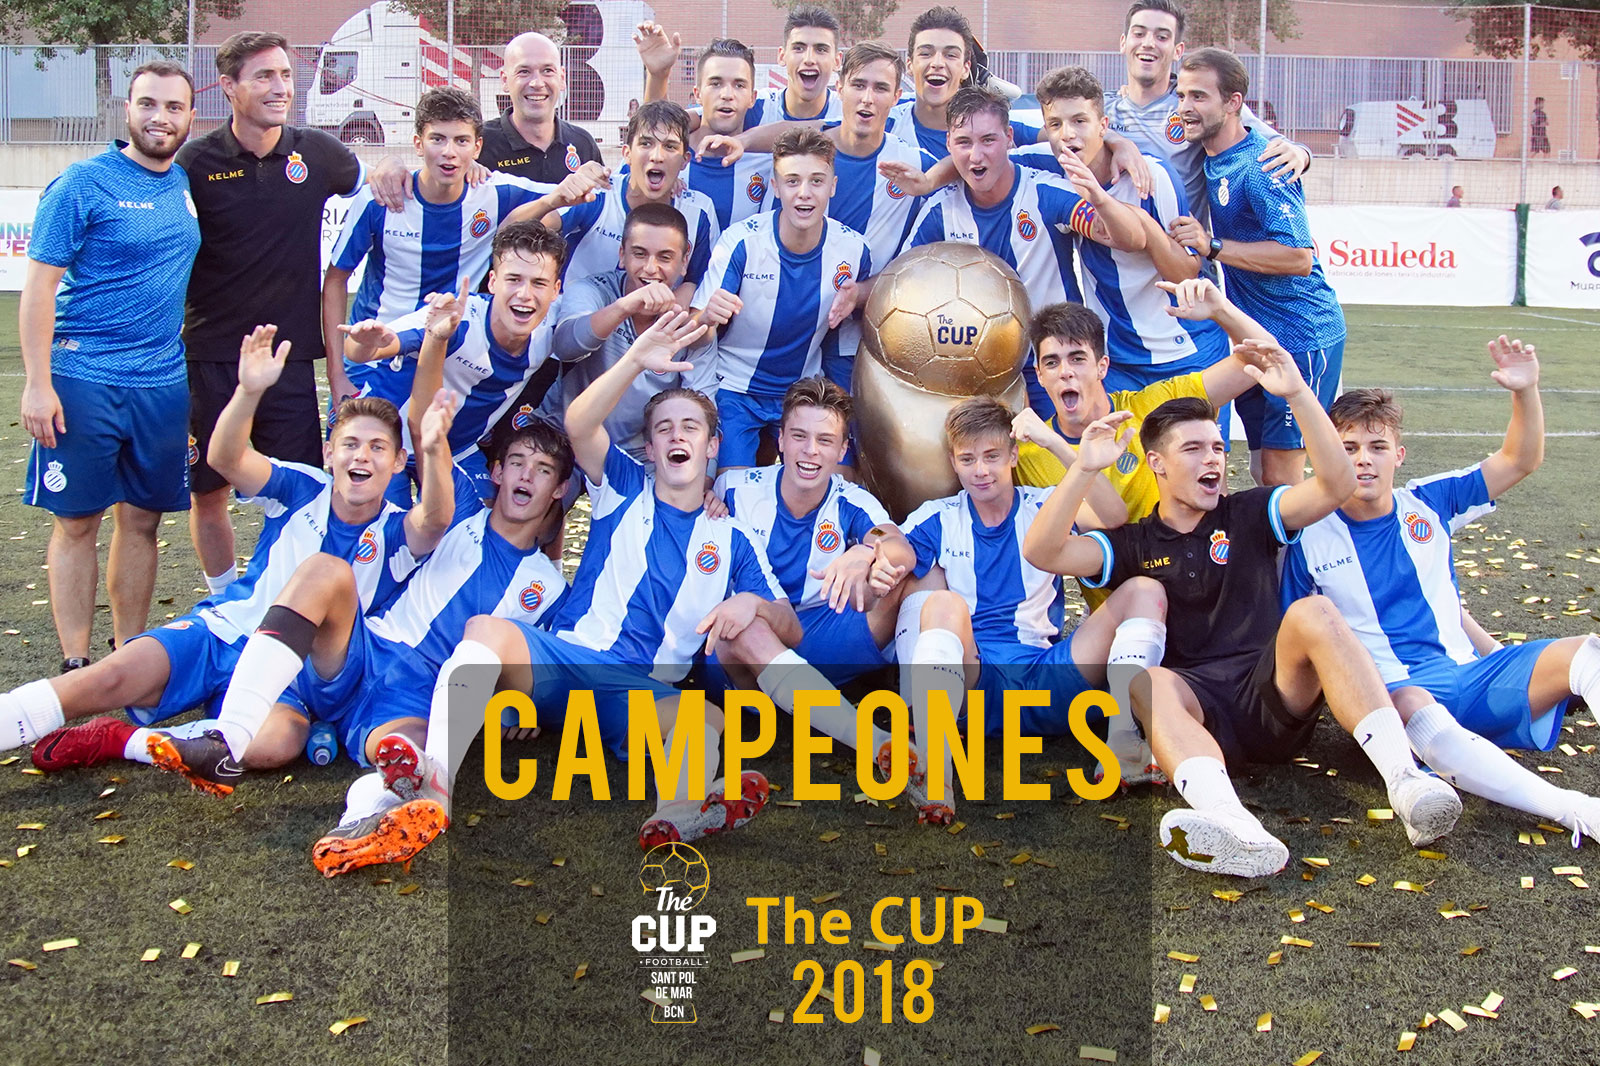 campeones_esp